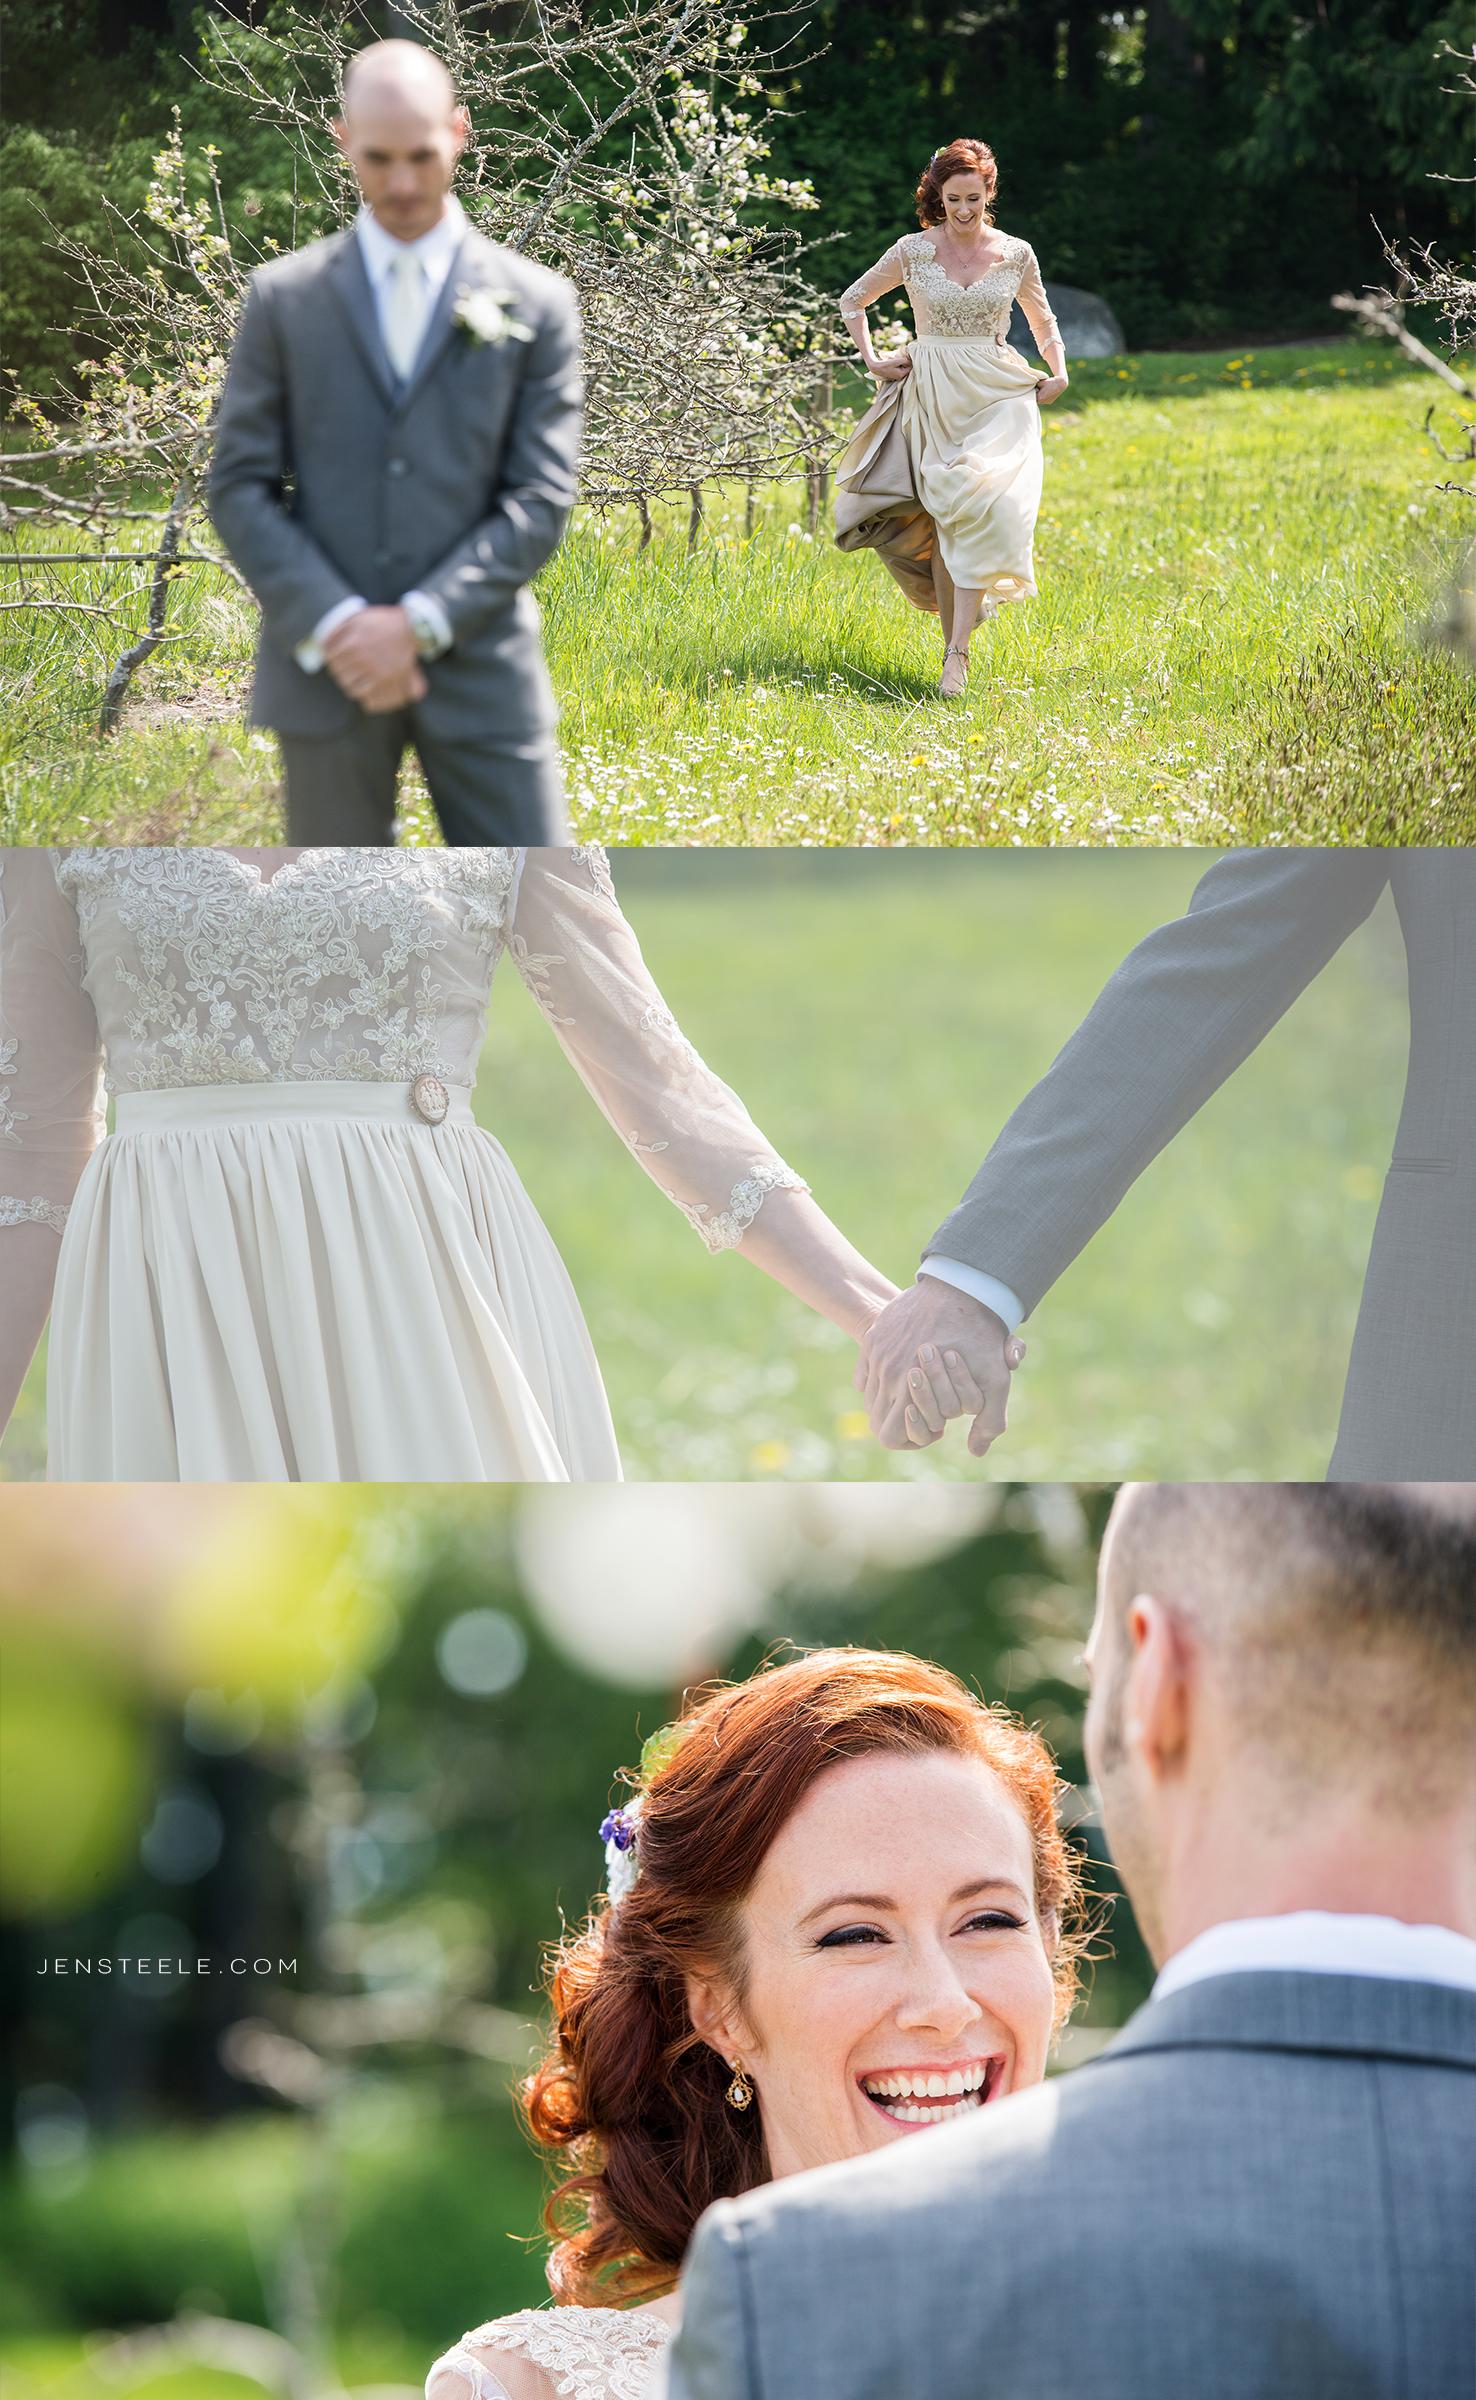 sea-cider-weddings-vancouver-island-weddings